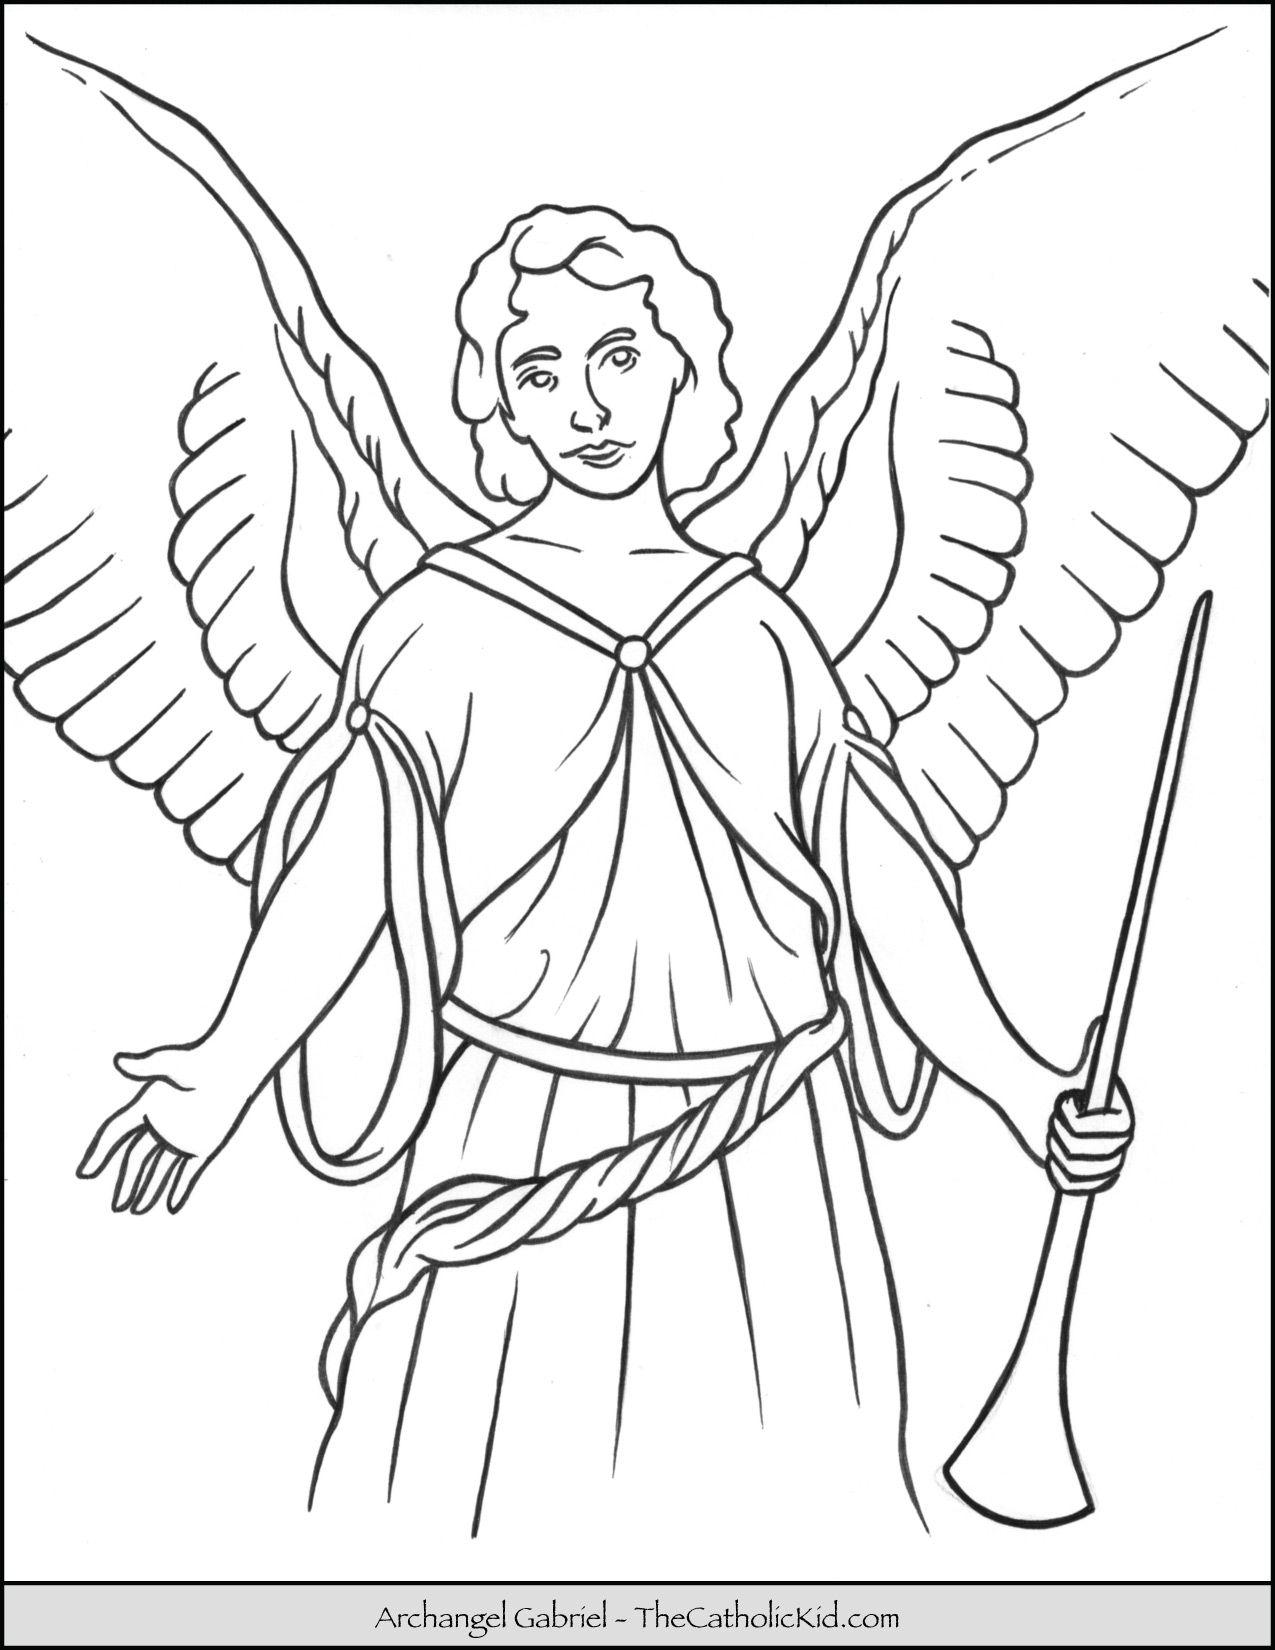 Archangel Gabriel Coloring Page Feastday: September 29